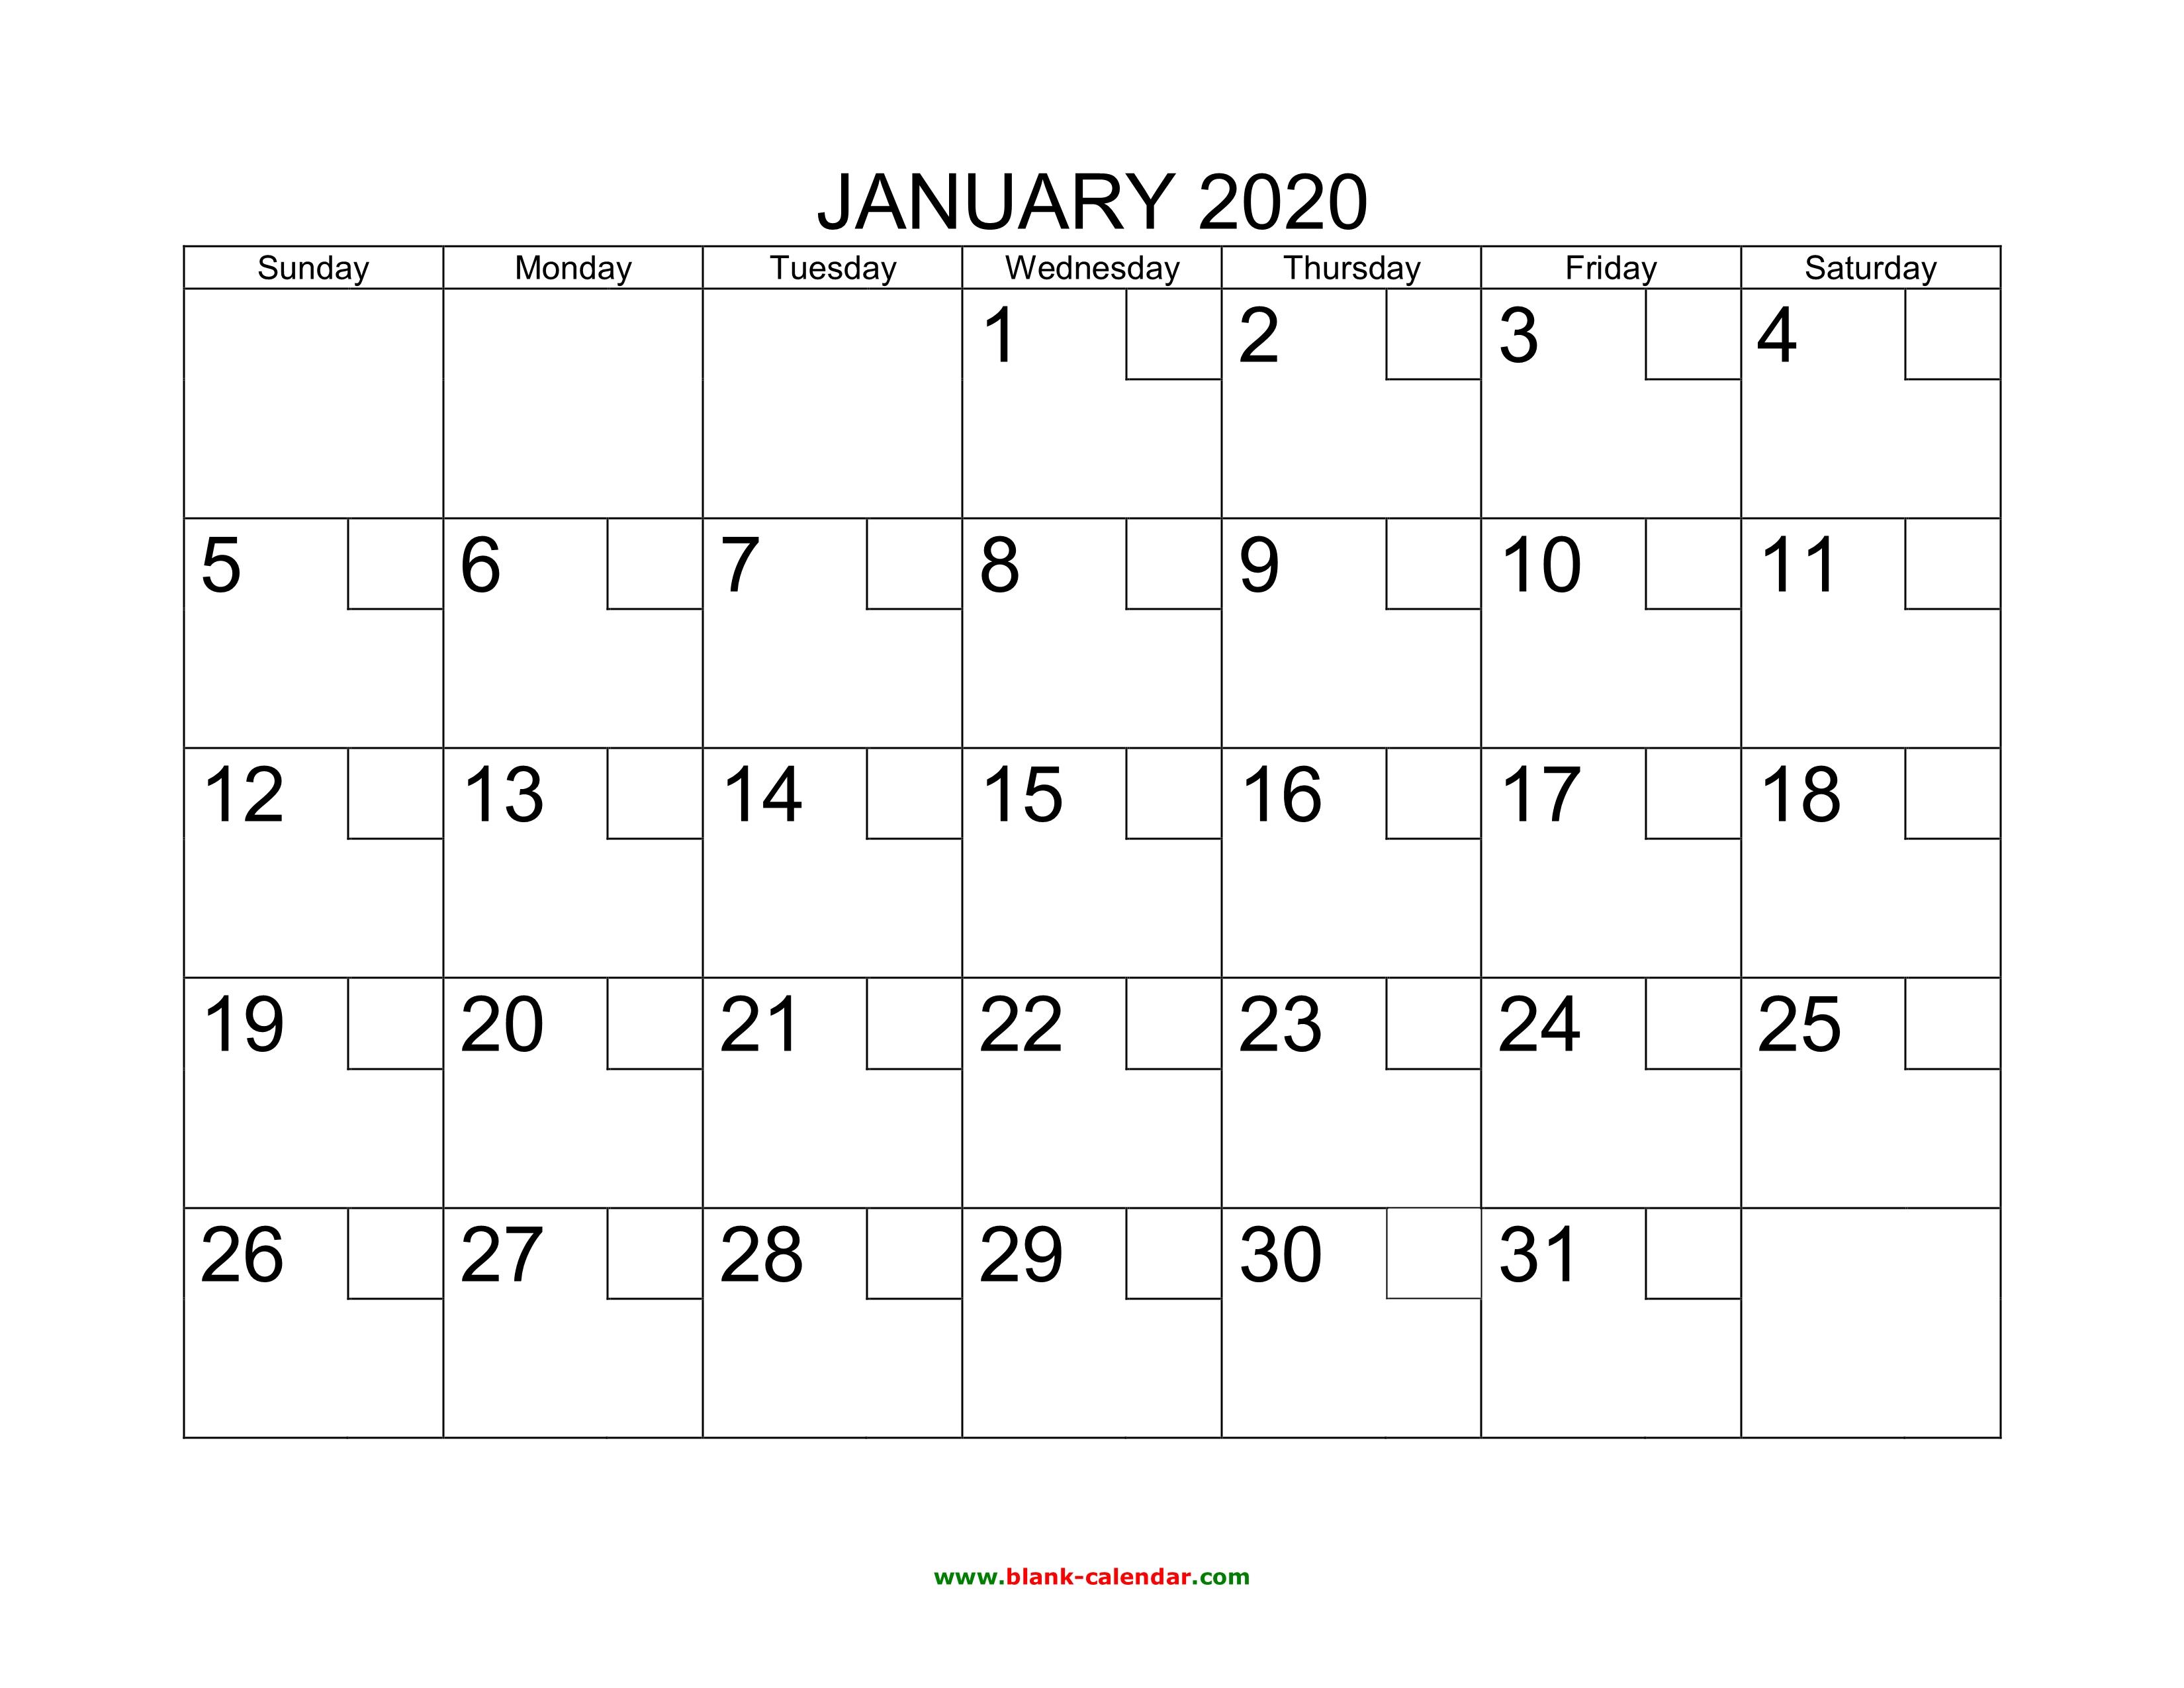 January 2020 Calendar Planner